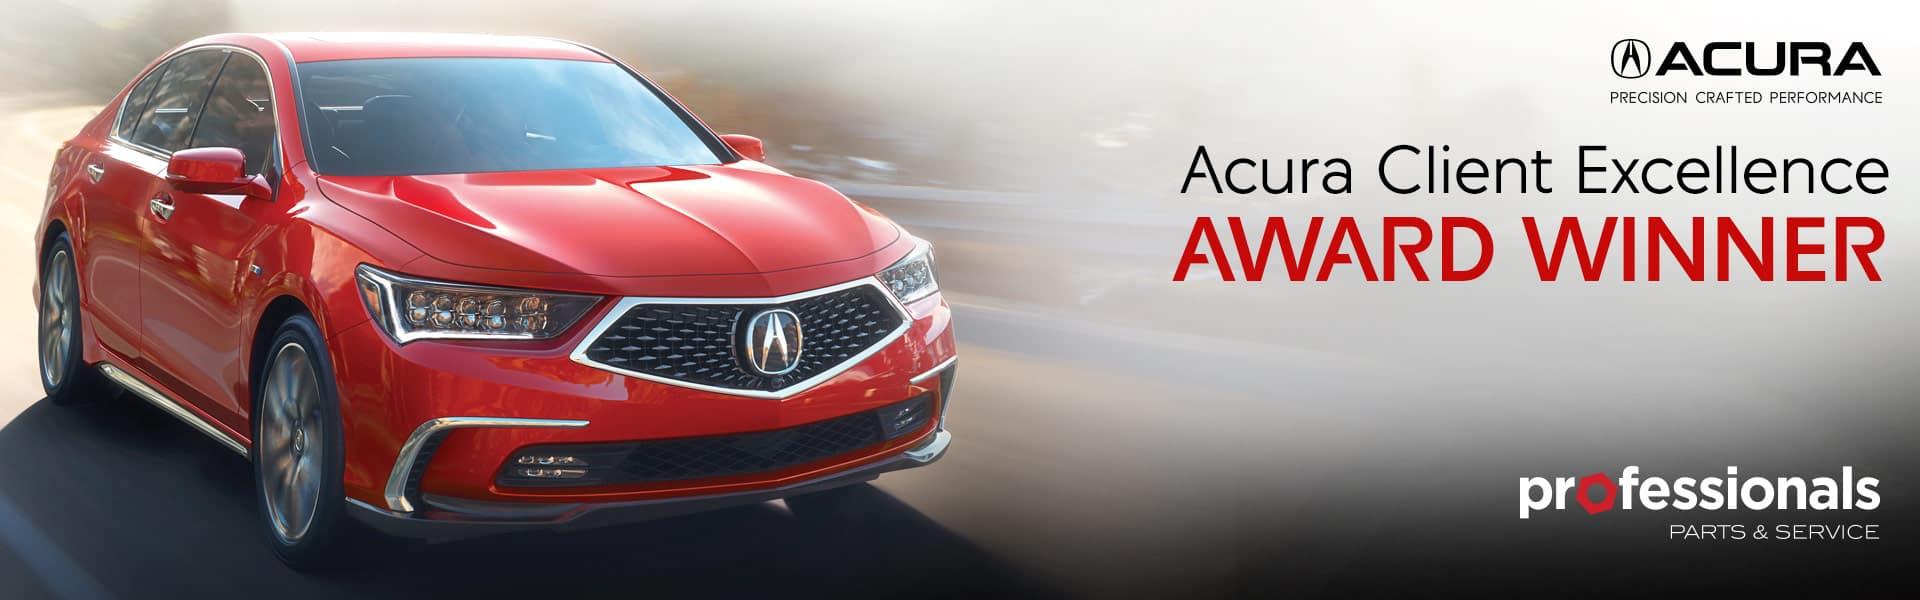 Acura Client Excellence Award